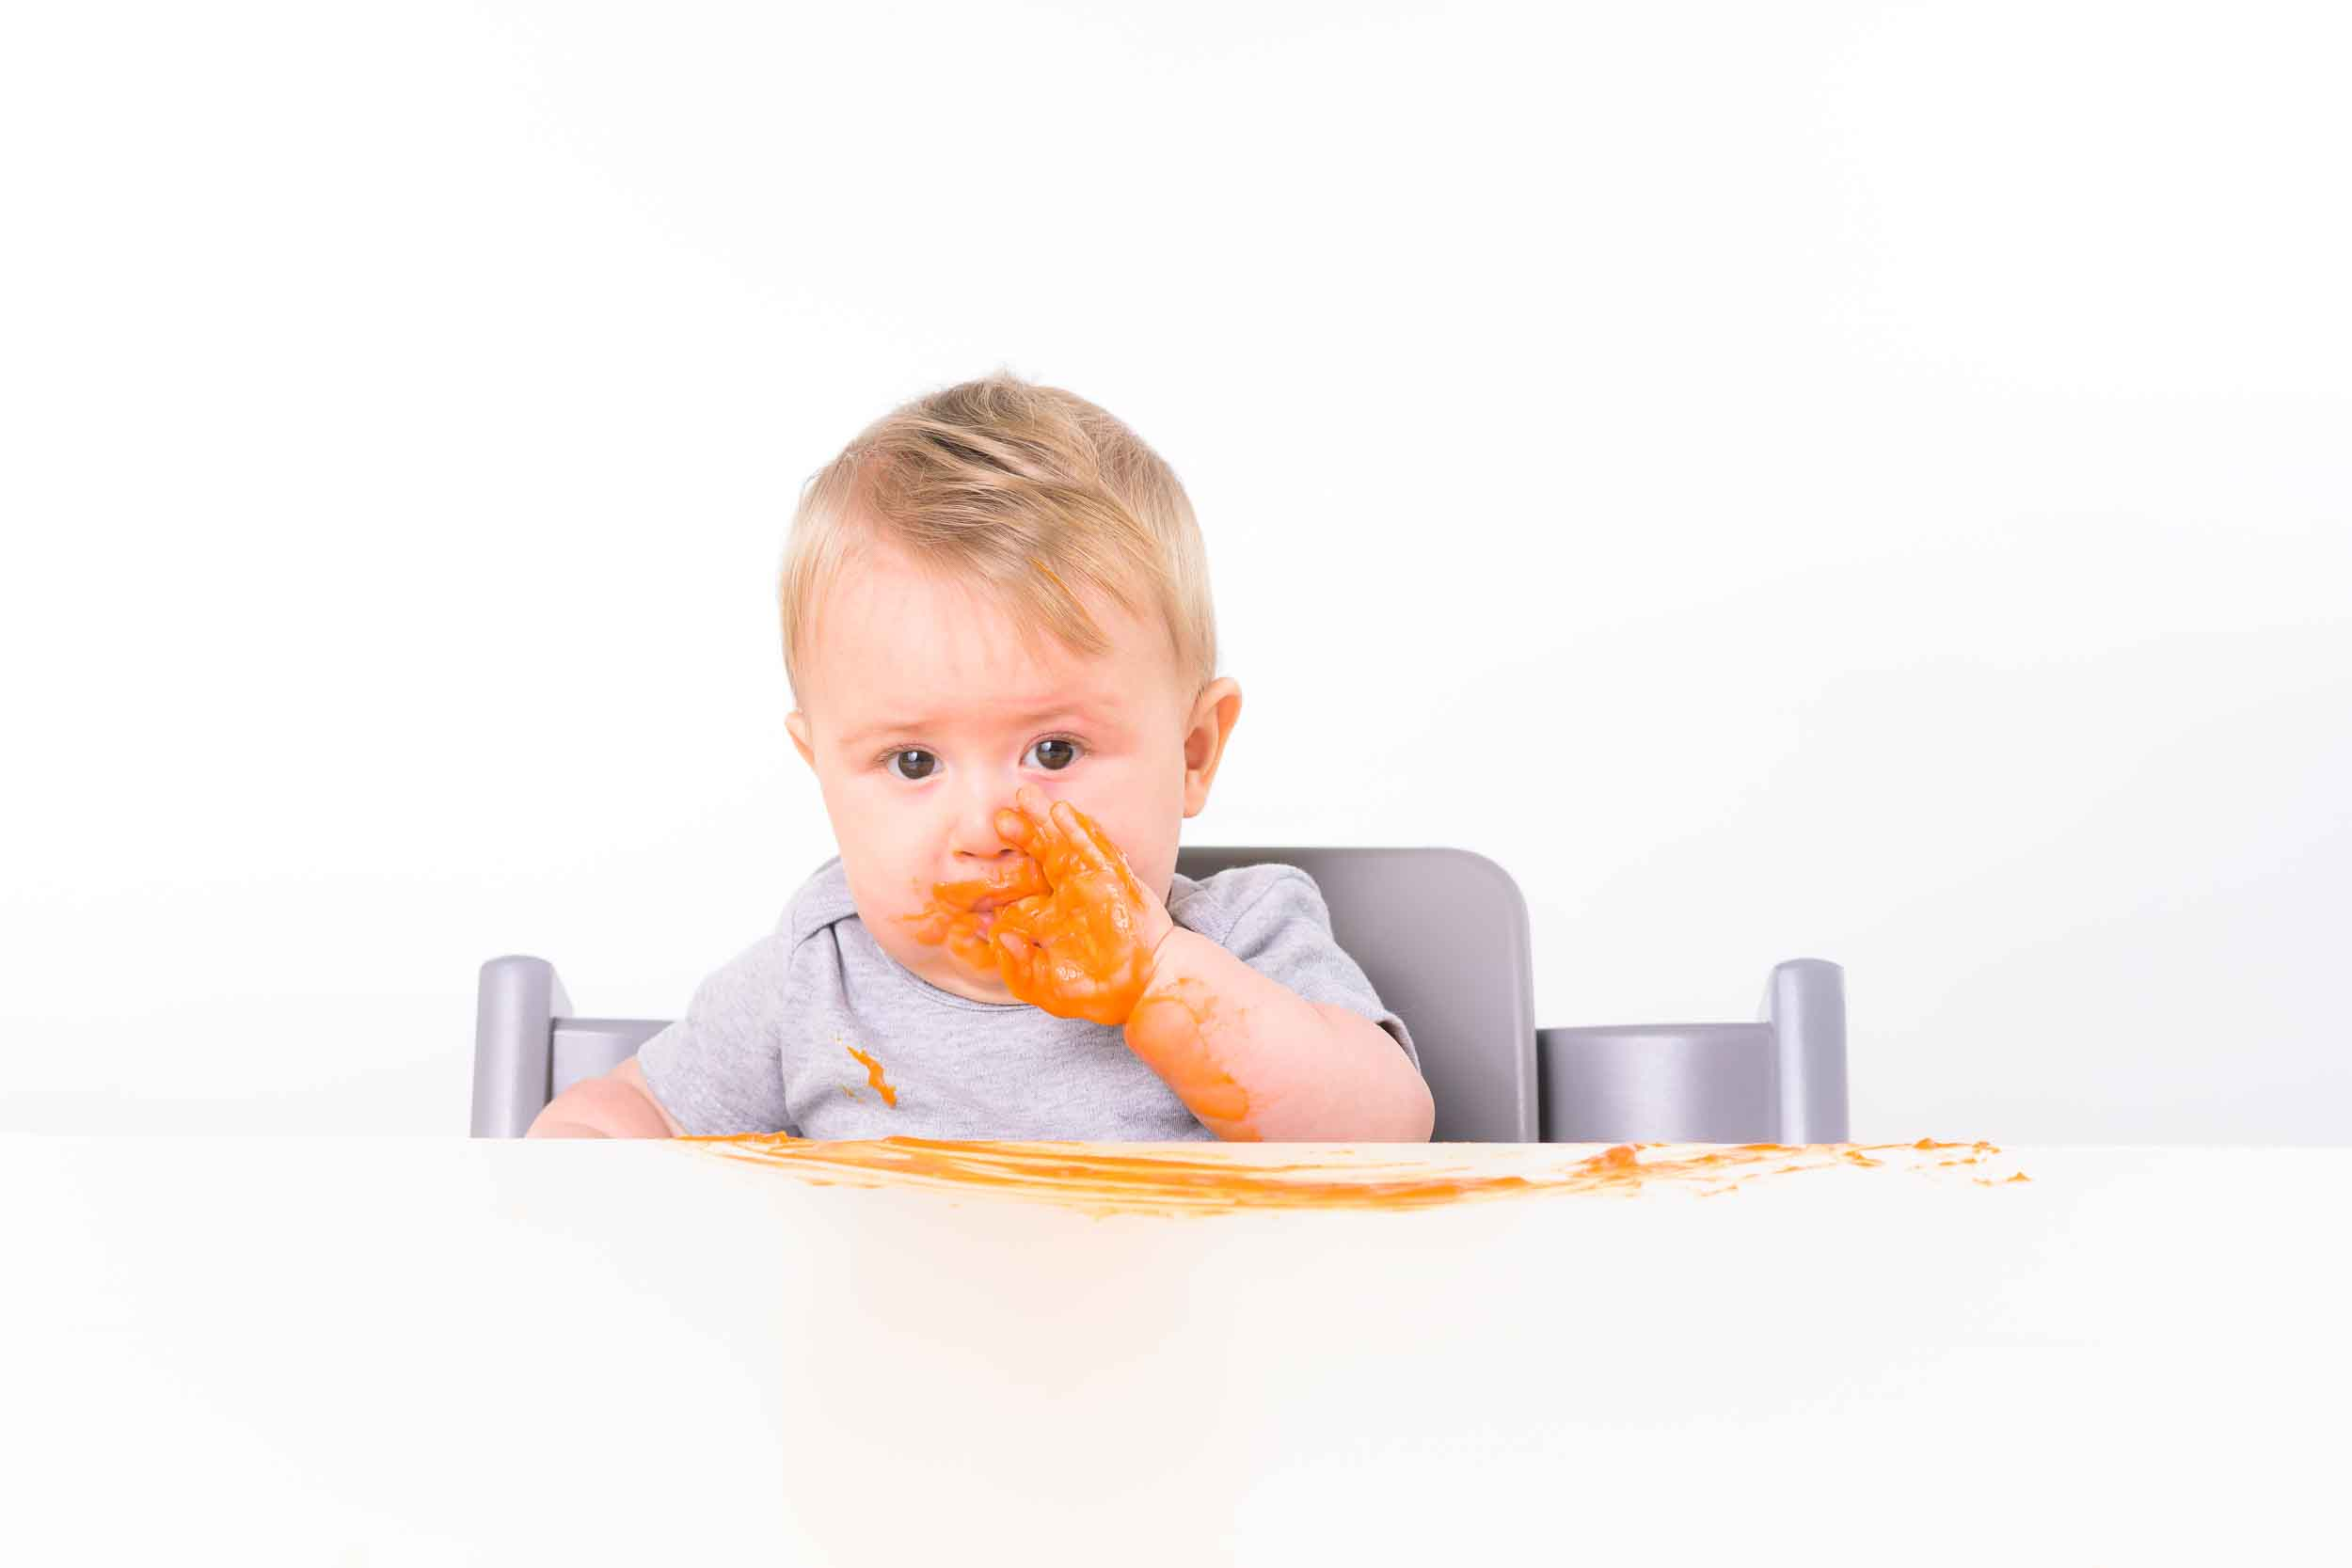 babies-little-food-co-business-commercial-professional-photographer-graham-images-washatka-wisconsin-appleton-green-bay-004-3401-blog.jpg